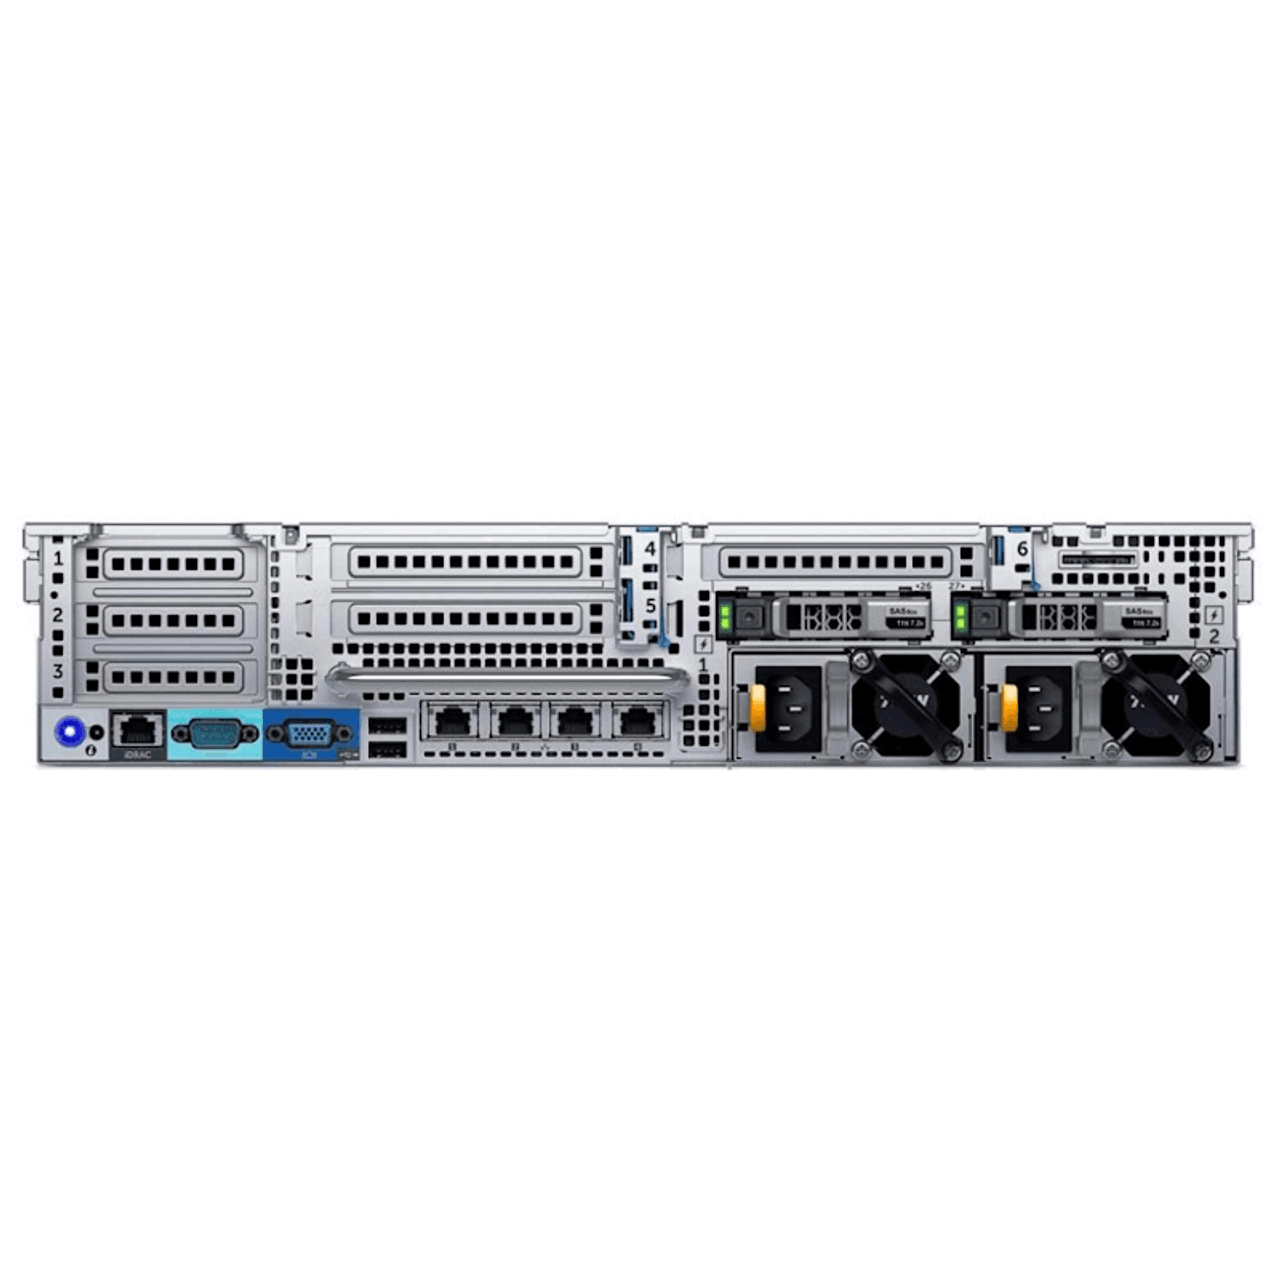 Renewed 32GB DDR4 2X Xeon E5-2650 V3 2.3GHz 10 Core 25MB 2X Trays Included 2X 750W PSUs iDRAC 8 Express Dell PowerEdge R630 8-Bay SFF 1U Server No Rail H330 2TB NVME SSD